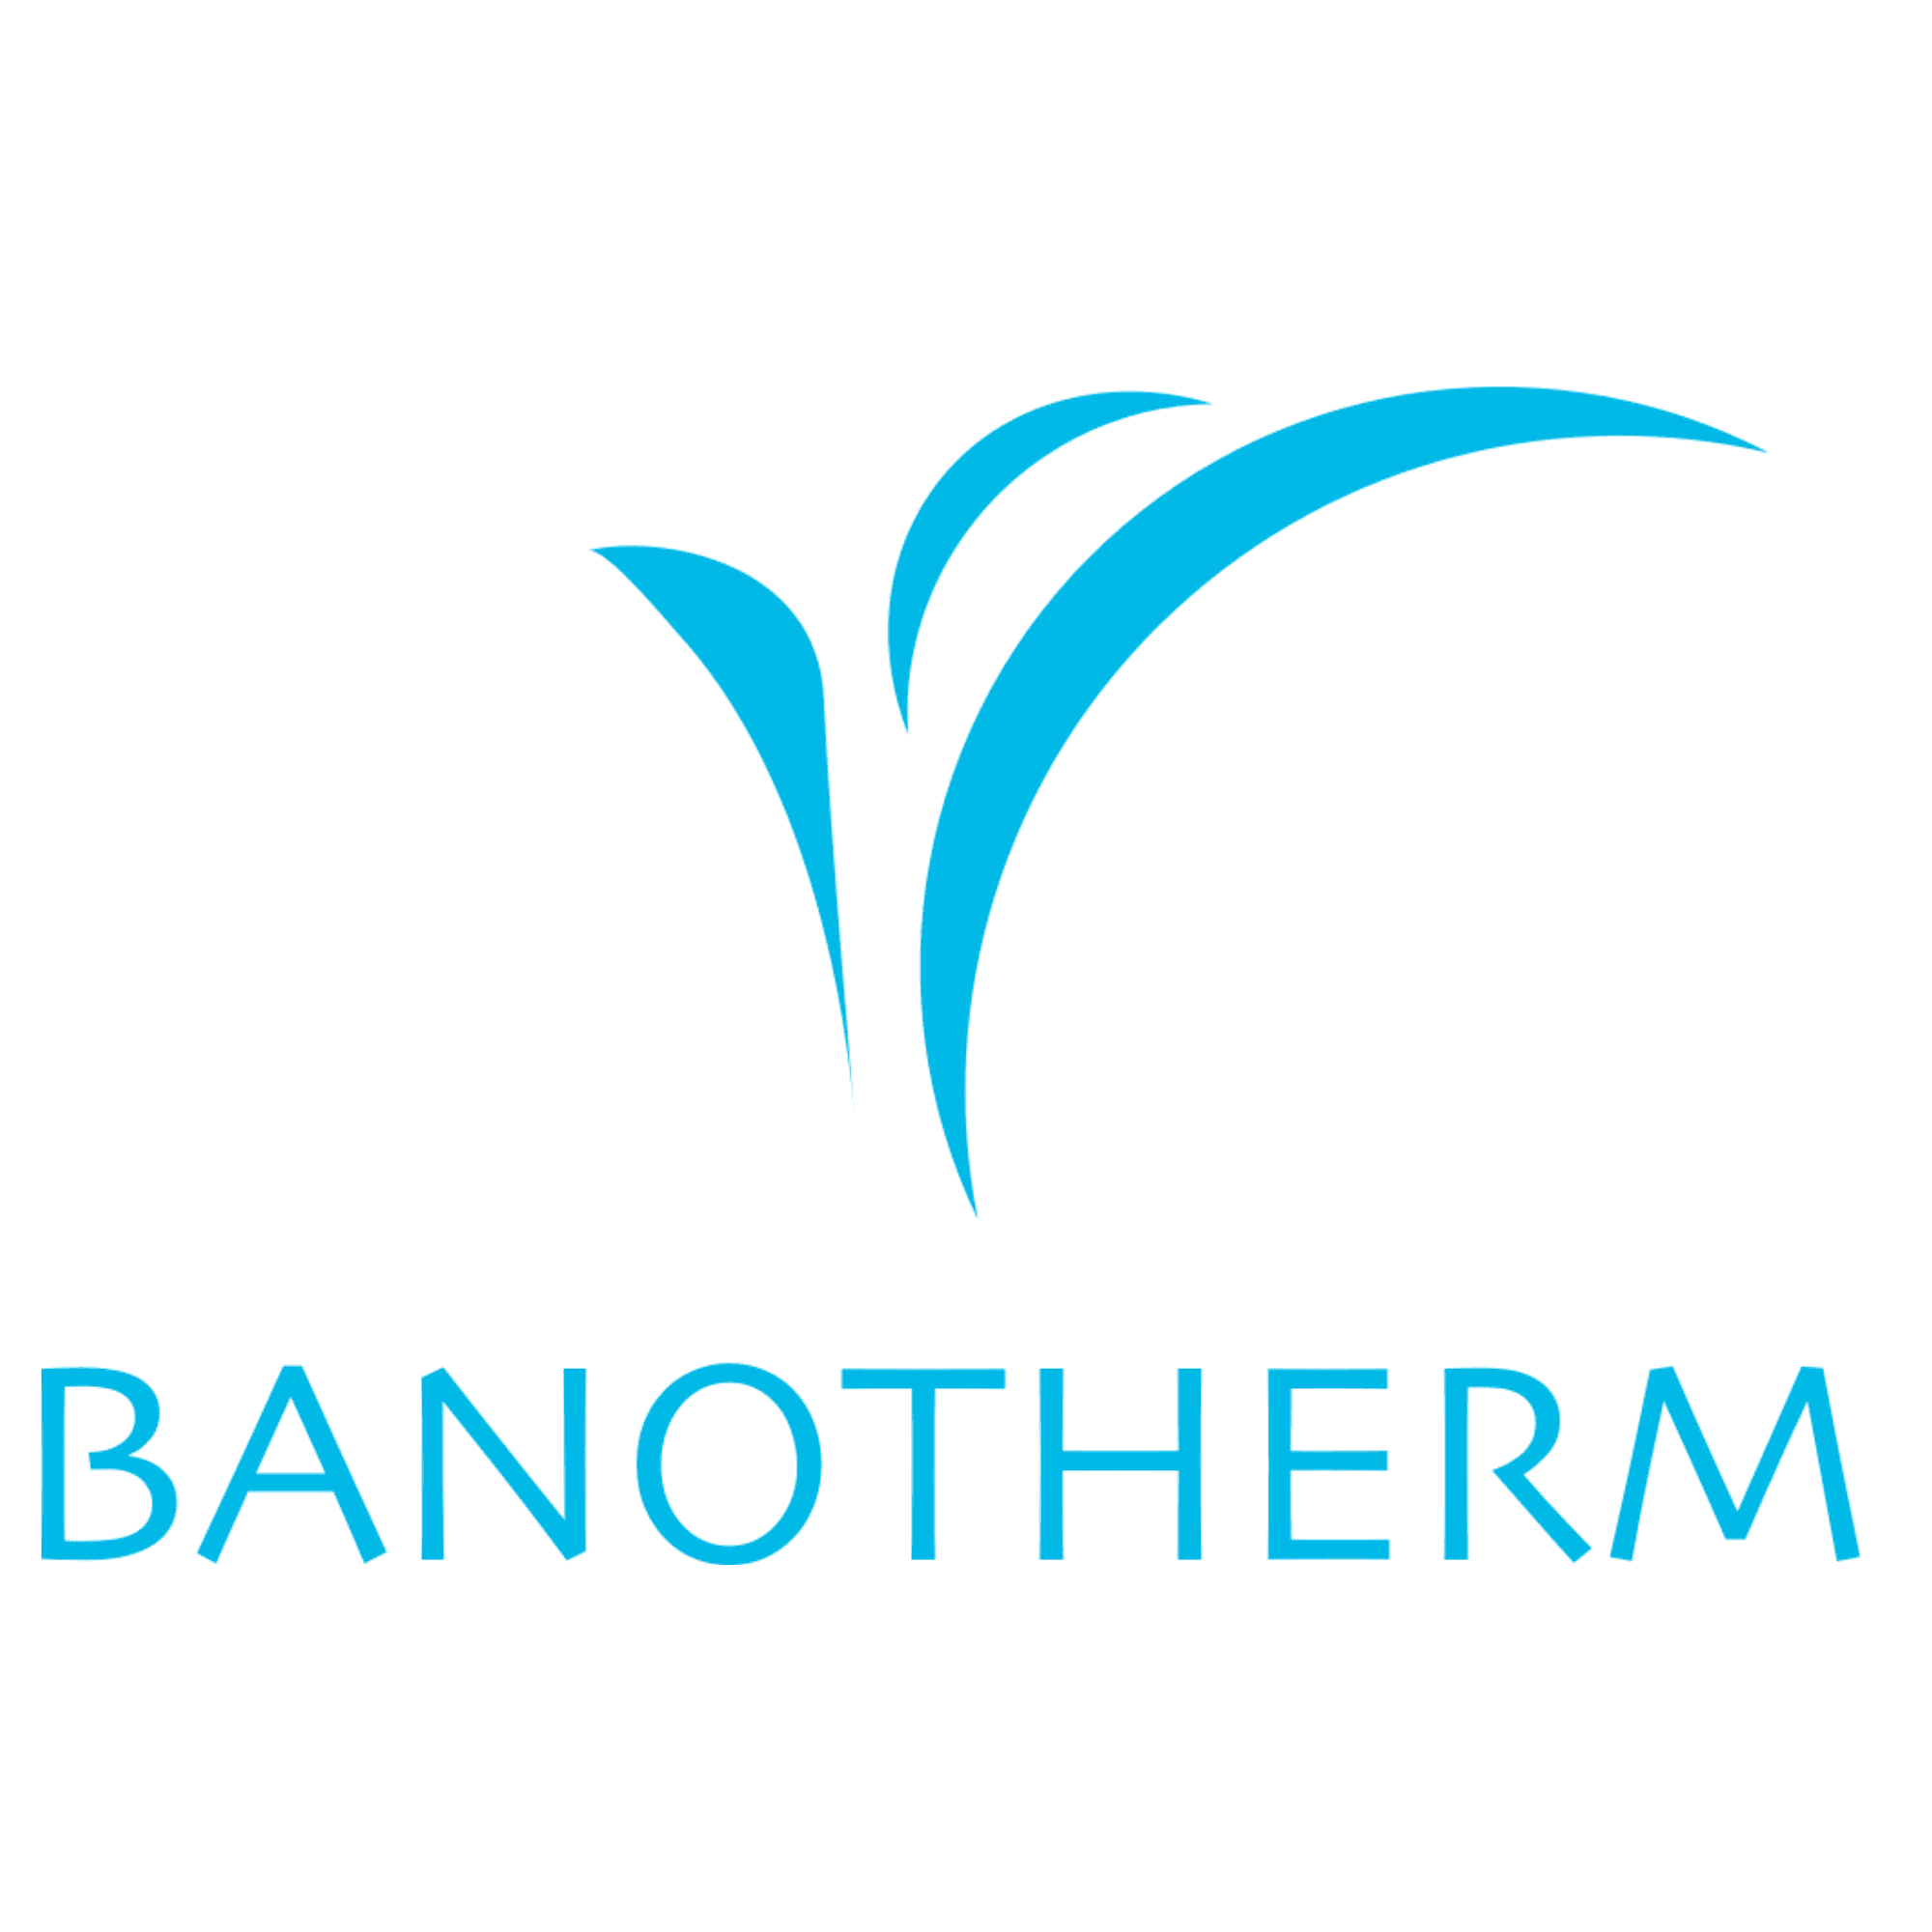 BANOTHERM